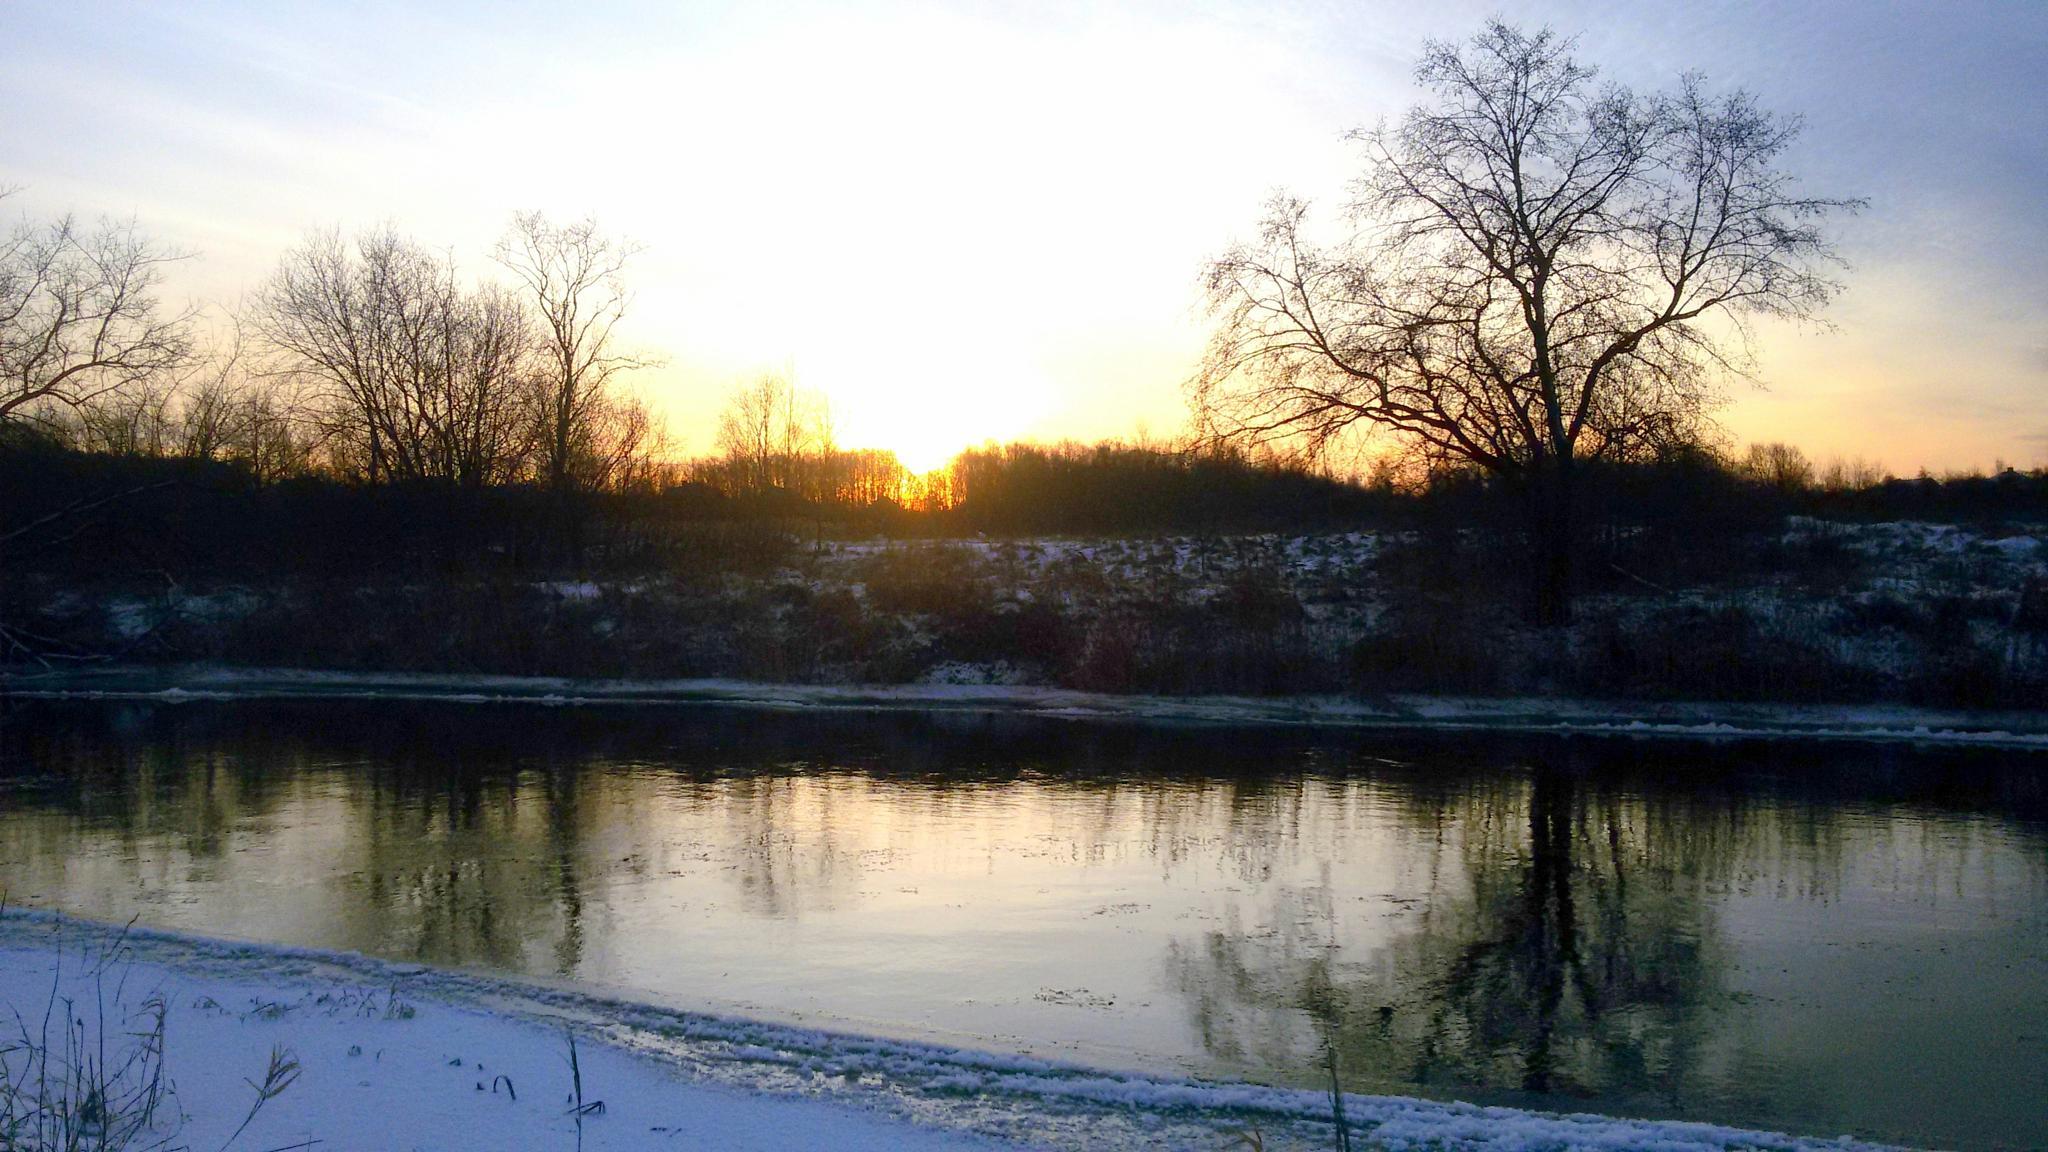 By the river. by Zita Užkuraitienė